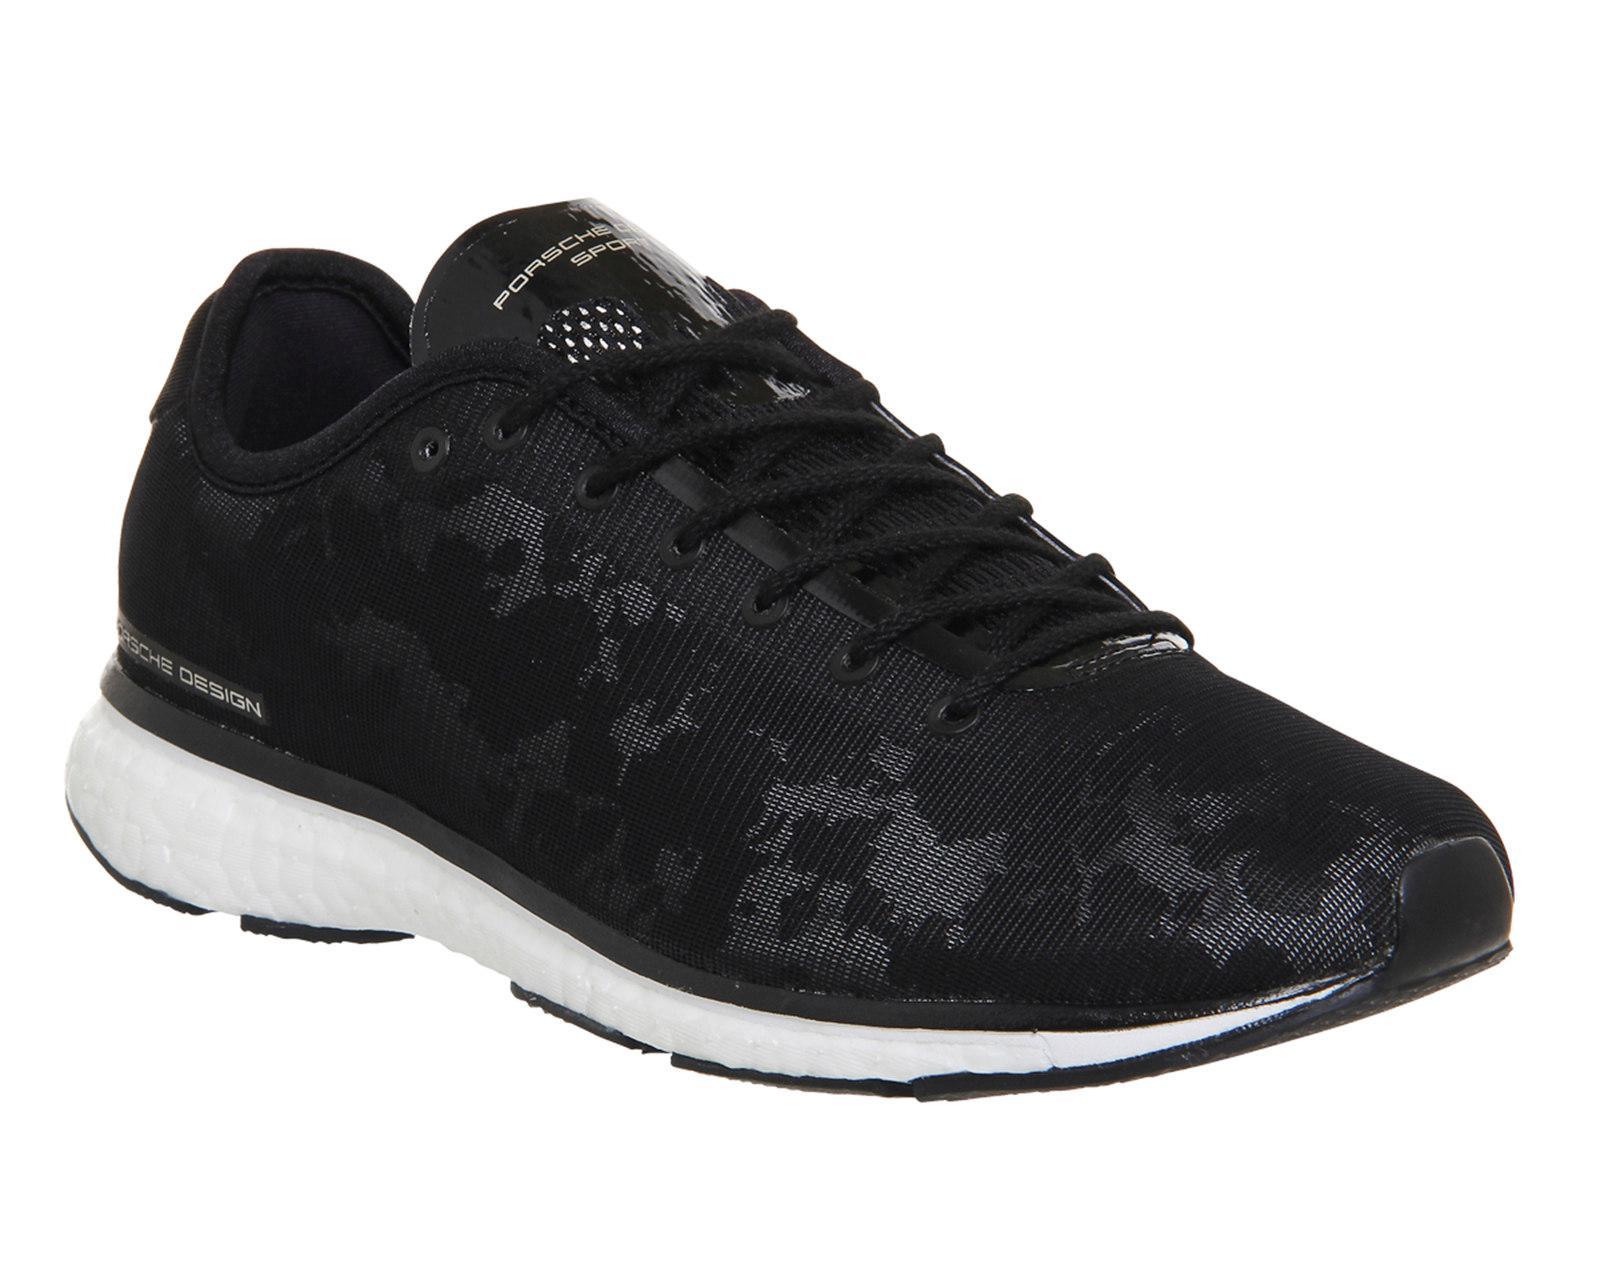 Adidas Originals Endurance Boost in Black for Men - Lyst 1b1973600